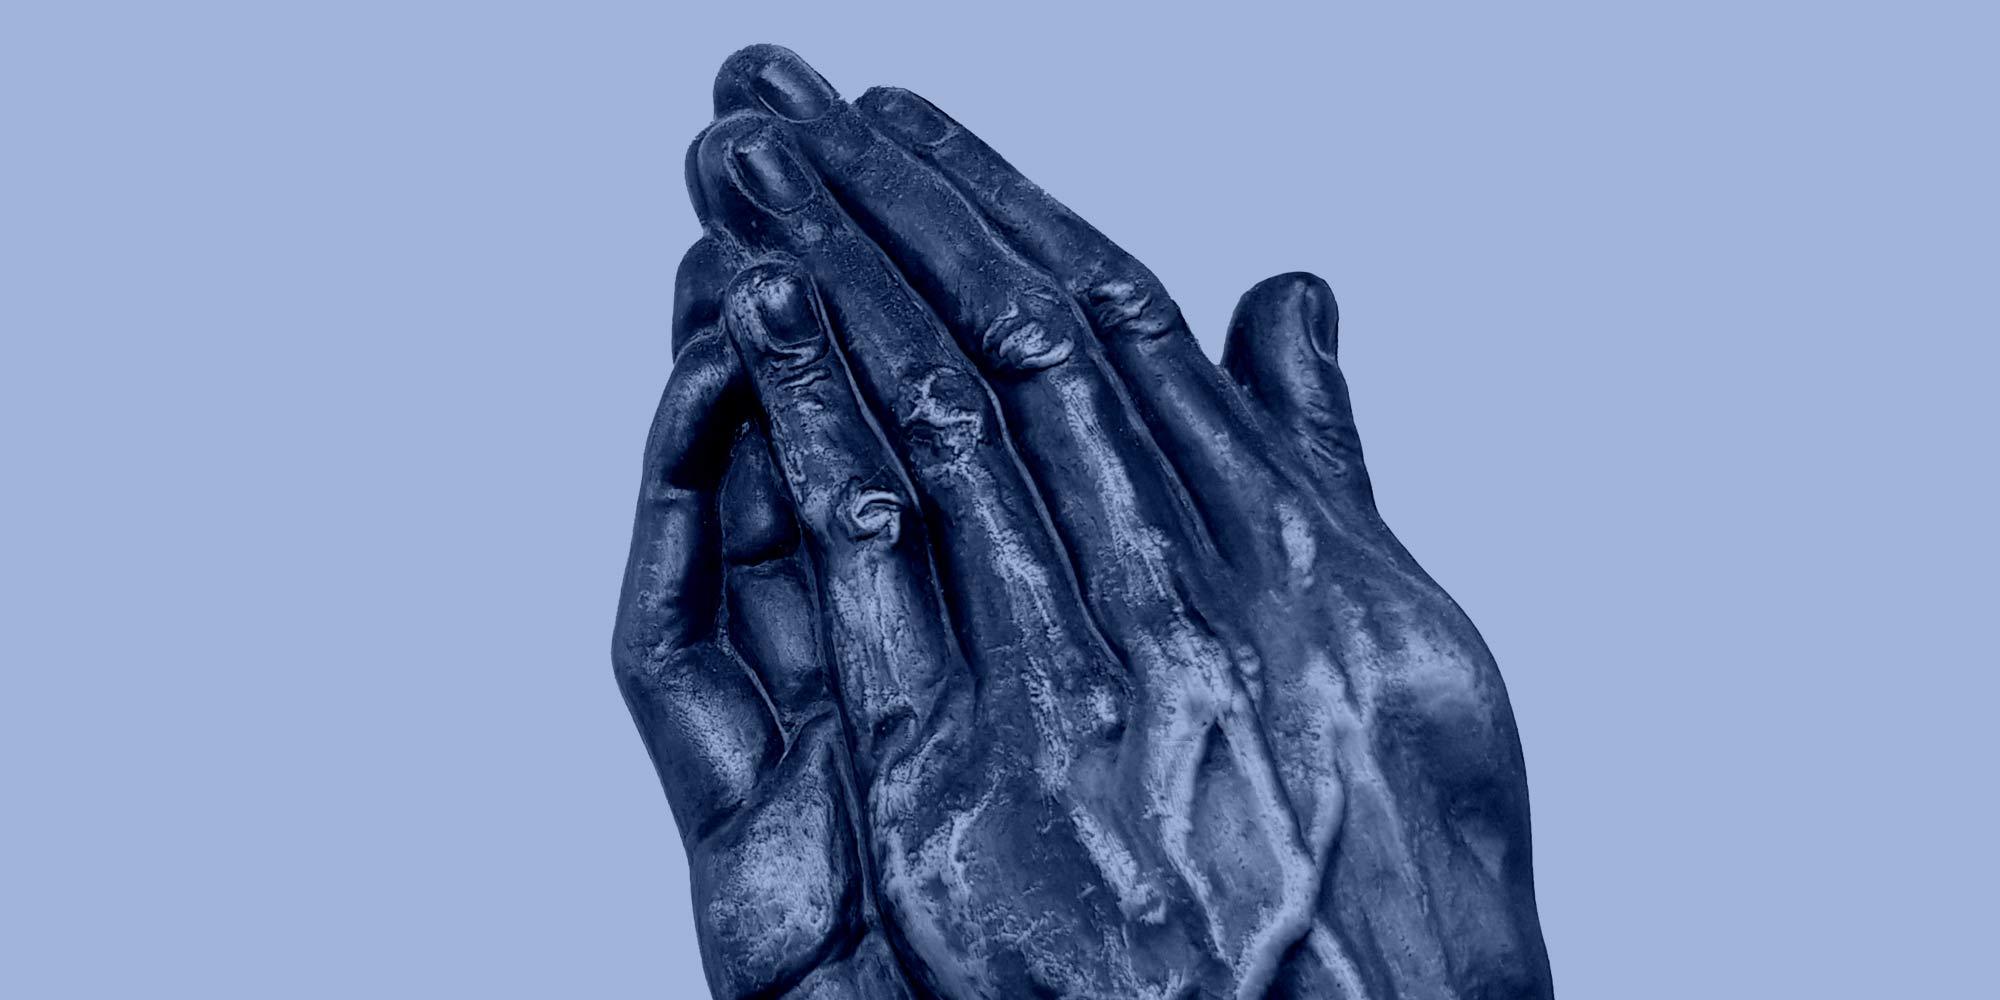 Sculpture of hands folded in prayer. The Serenity Prayer